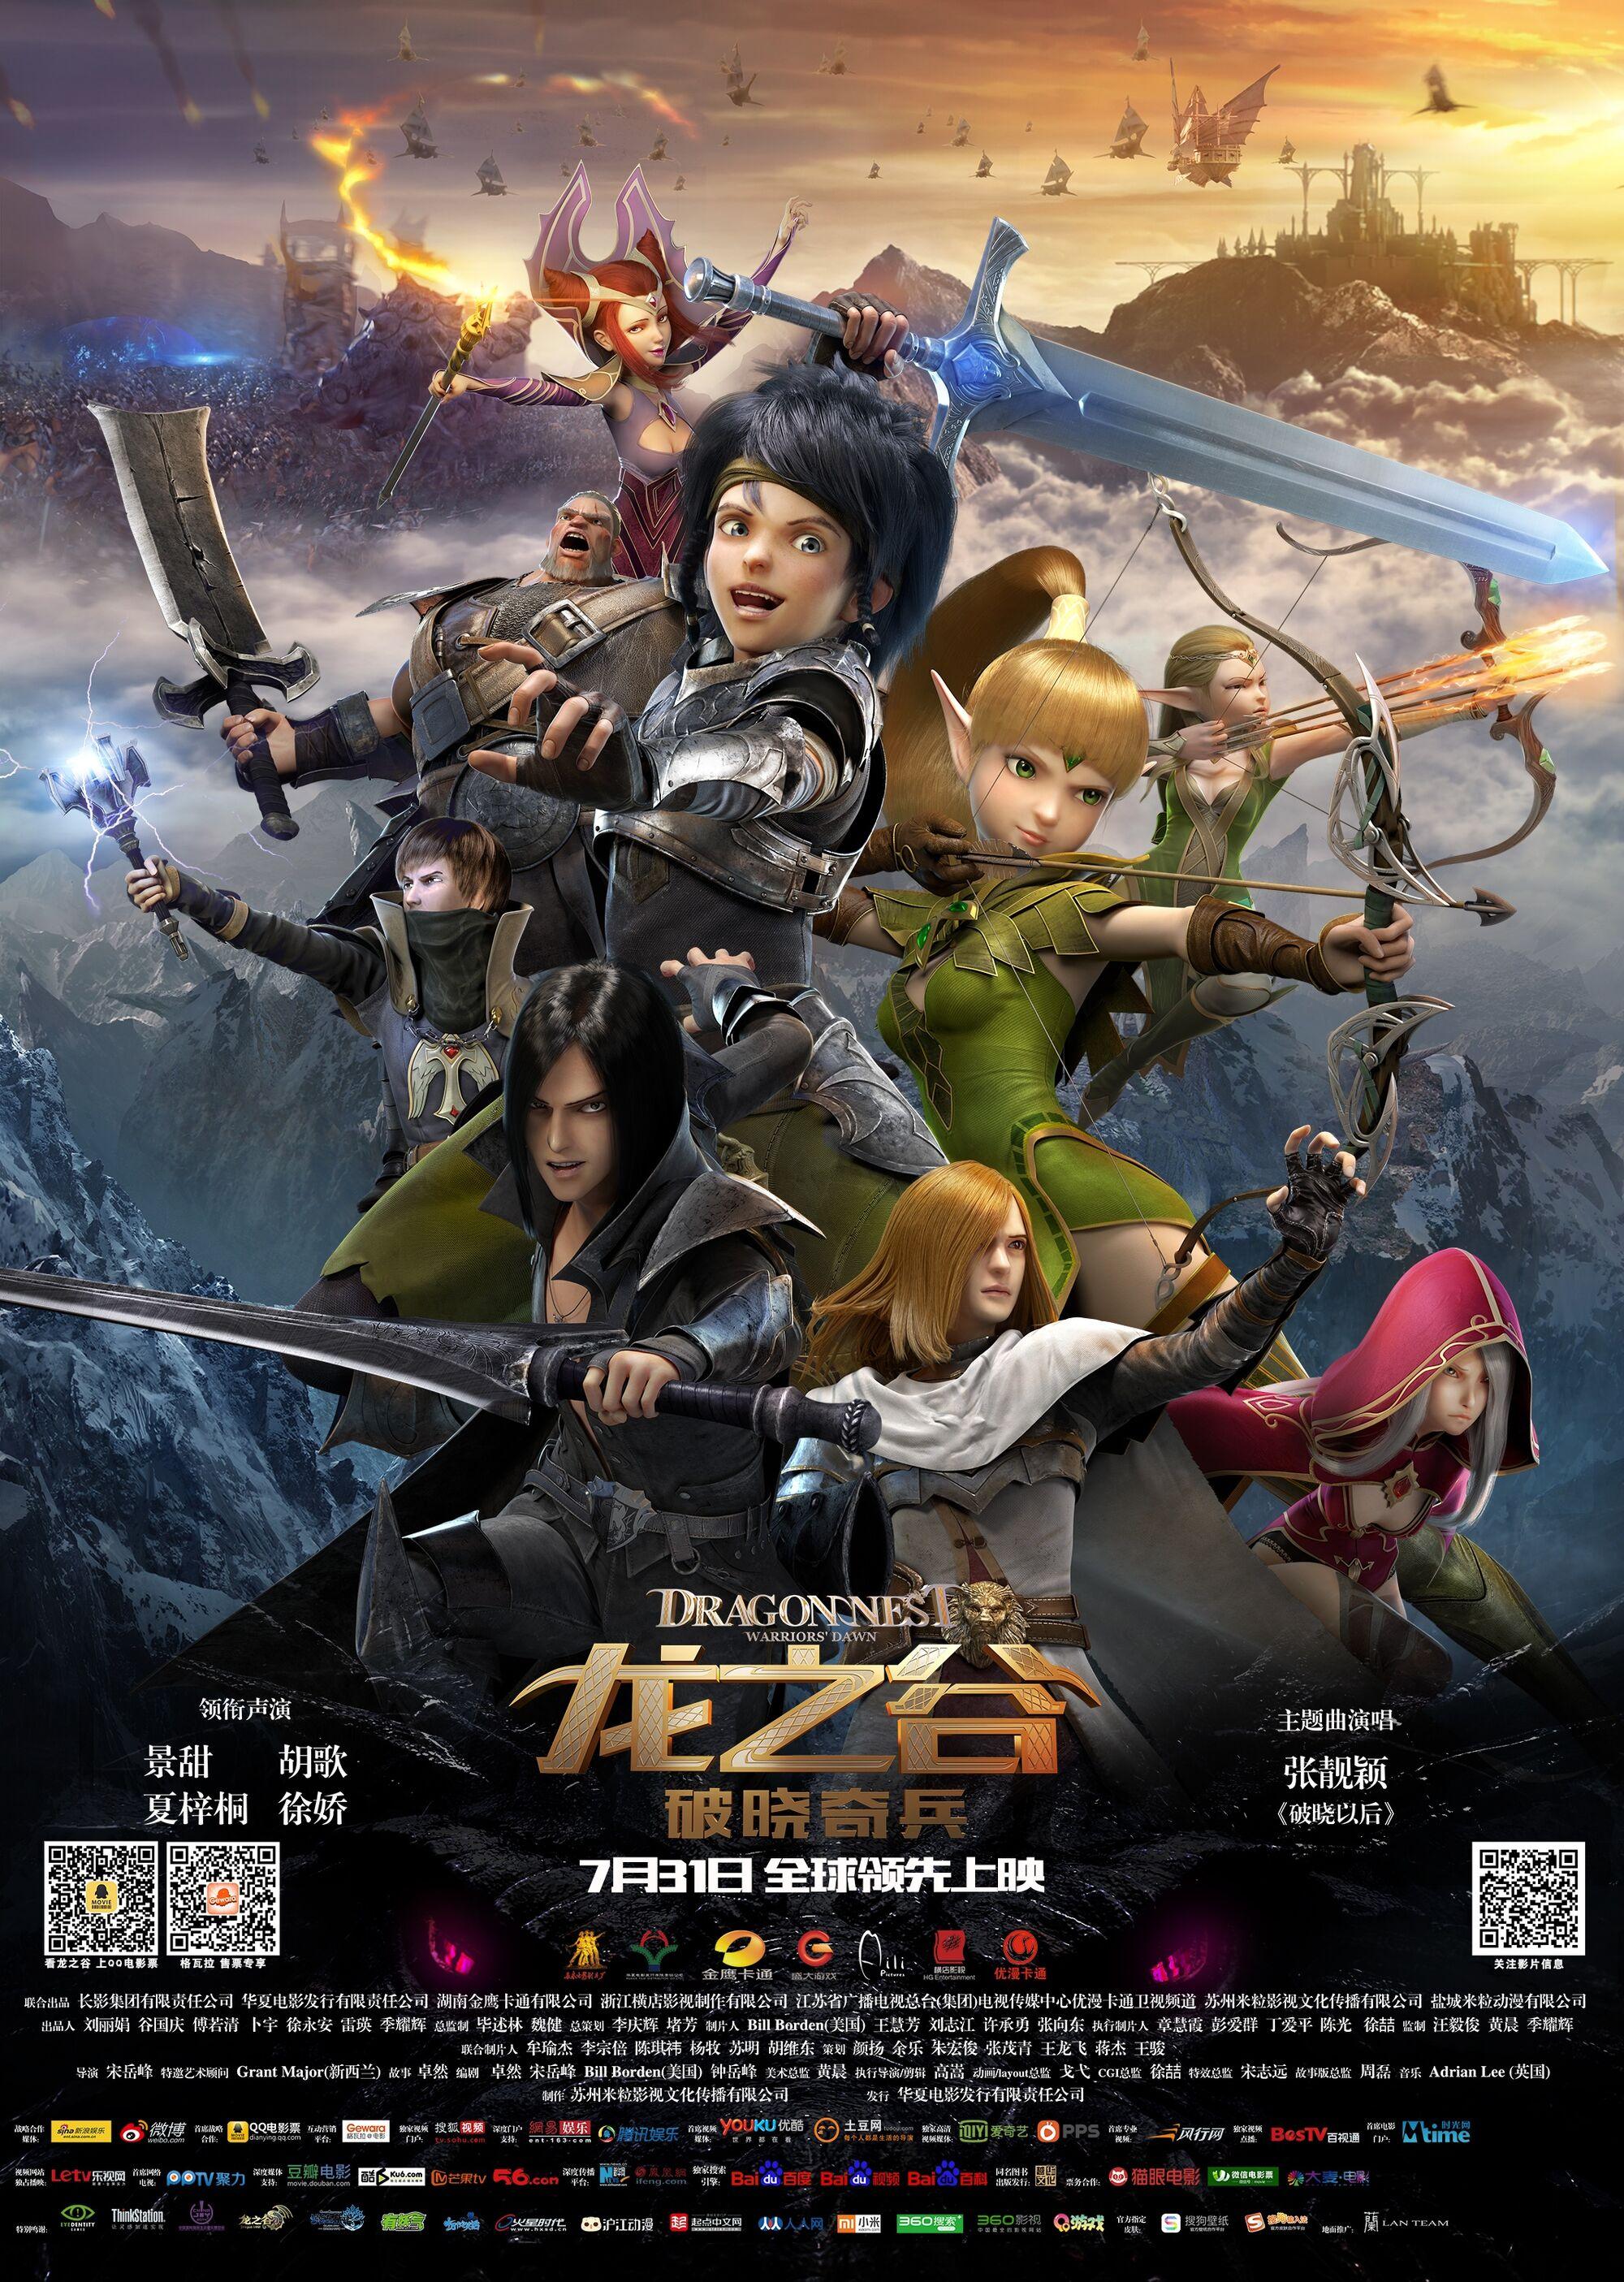 Dragon Nest Warrior s Dawn Dragon Nest SEA Wiki